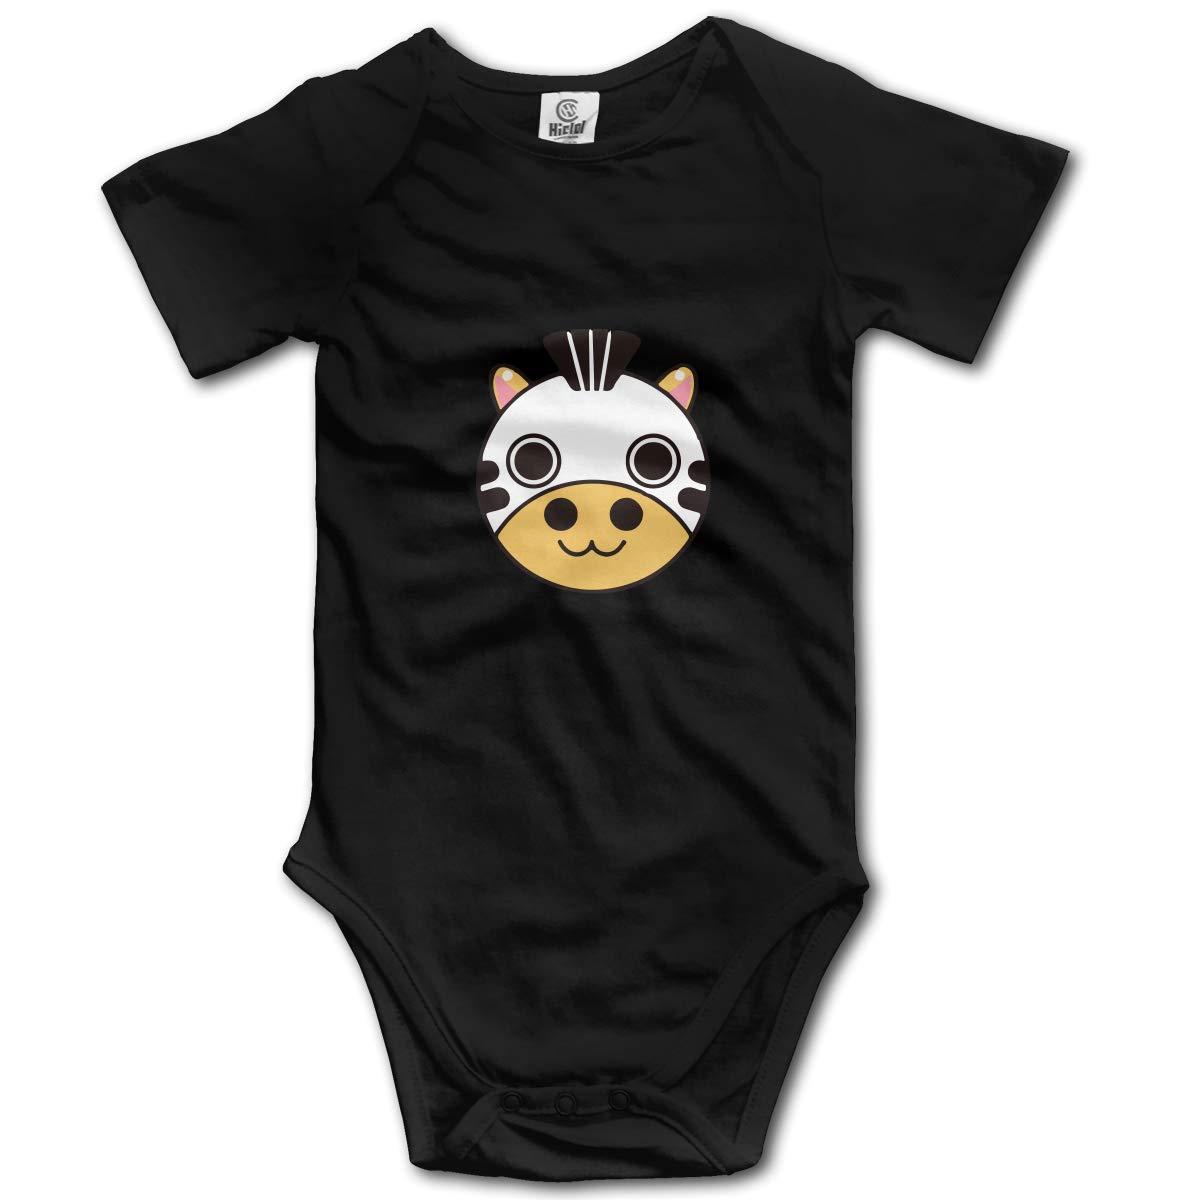 XHX Newborn Baby Cartoon Cow Face Short Sleeve Romper Onesie Bodysuit Jumpsuit